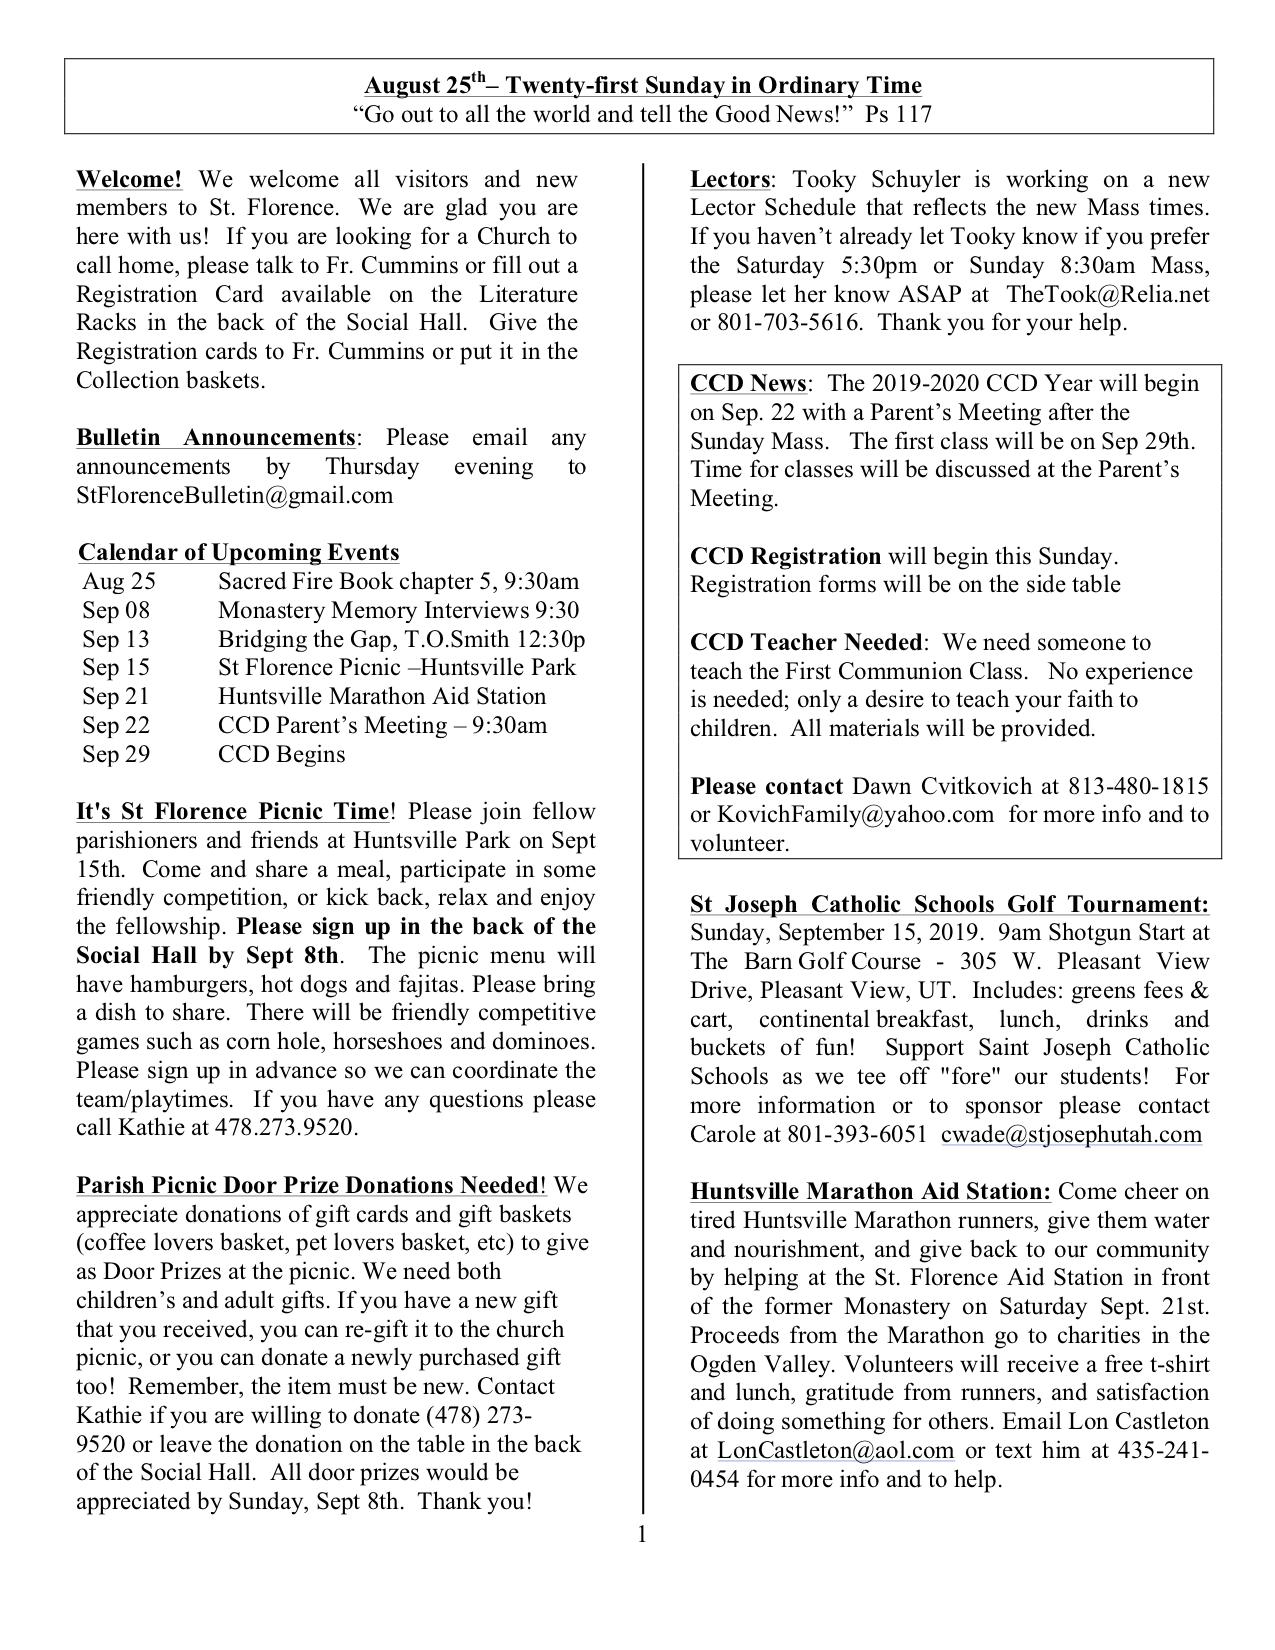 Events In Massachusetts August 25 2020.Church Bulletin August 25 2019 St Florence Catholic Church